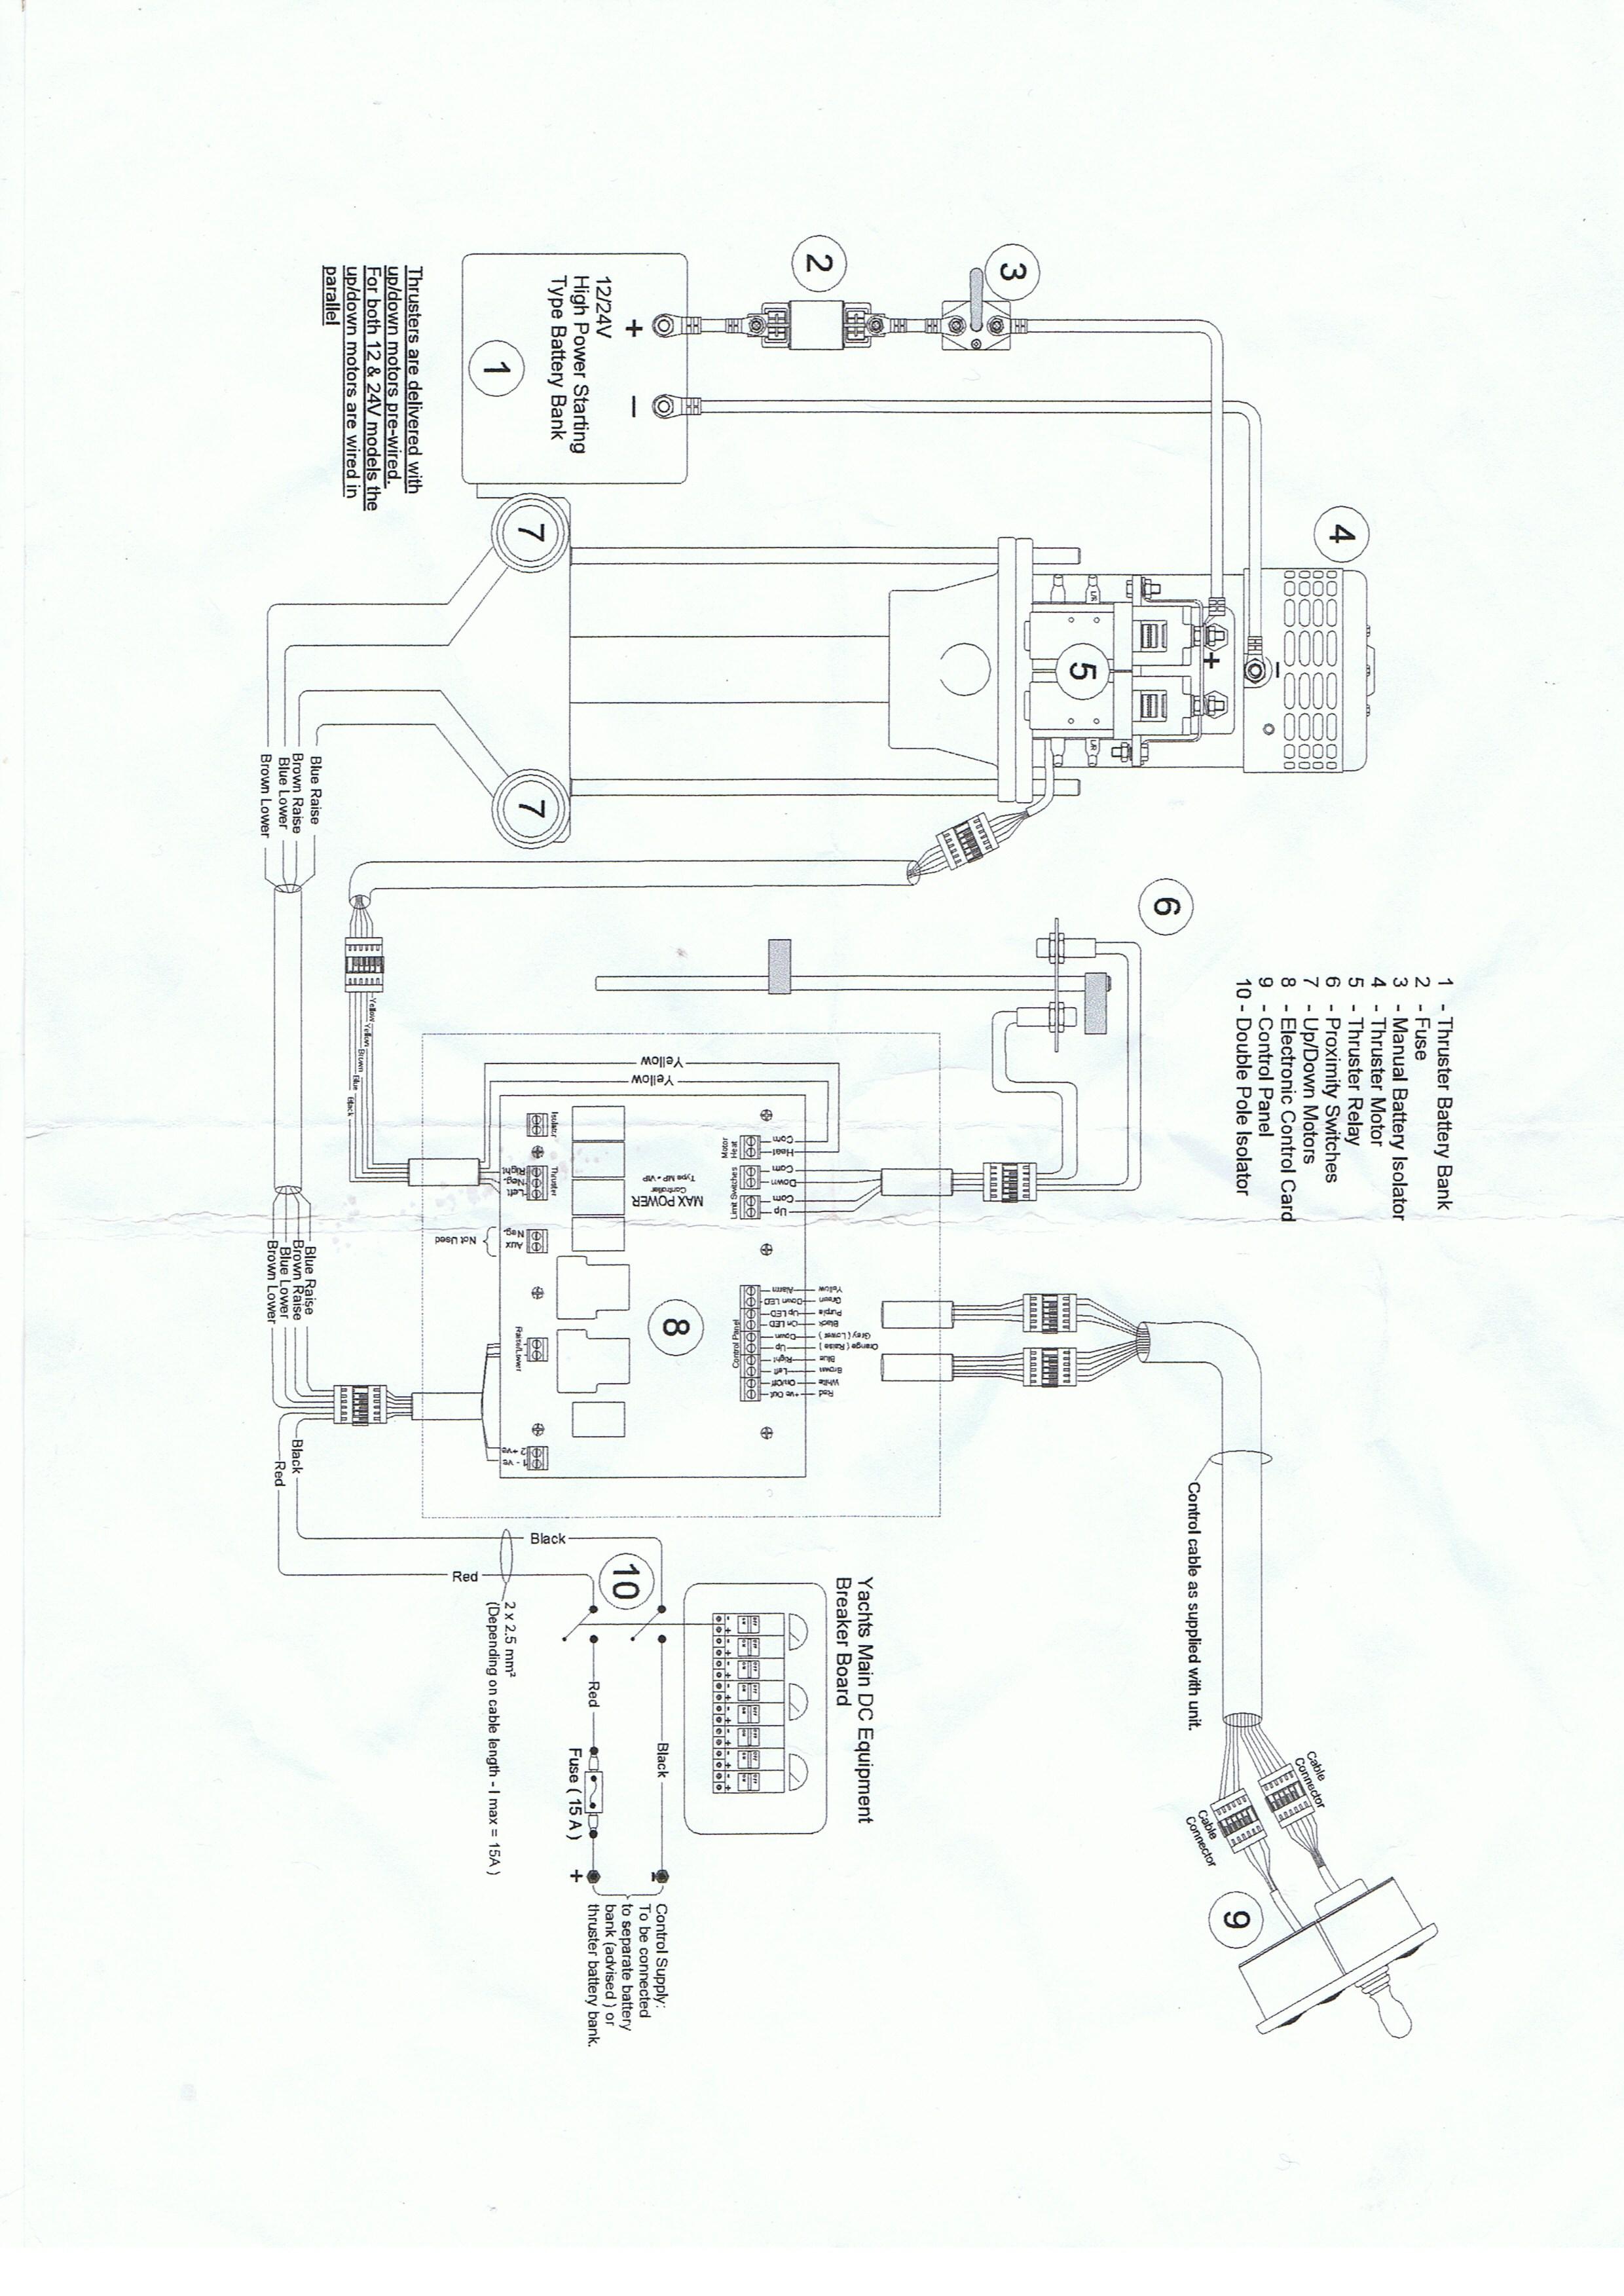 Volvo Penta Bow Thruster Wiring Diagram Wiring Diagram Ground Total Ground Total Hoteloctavia It